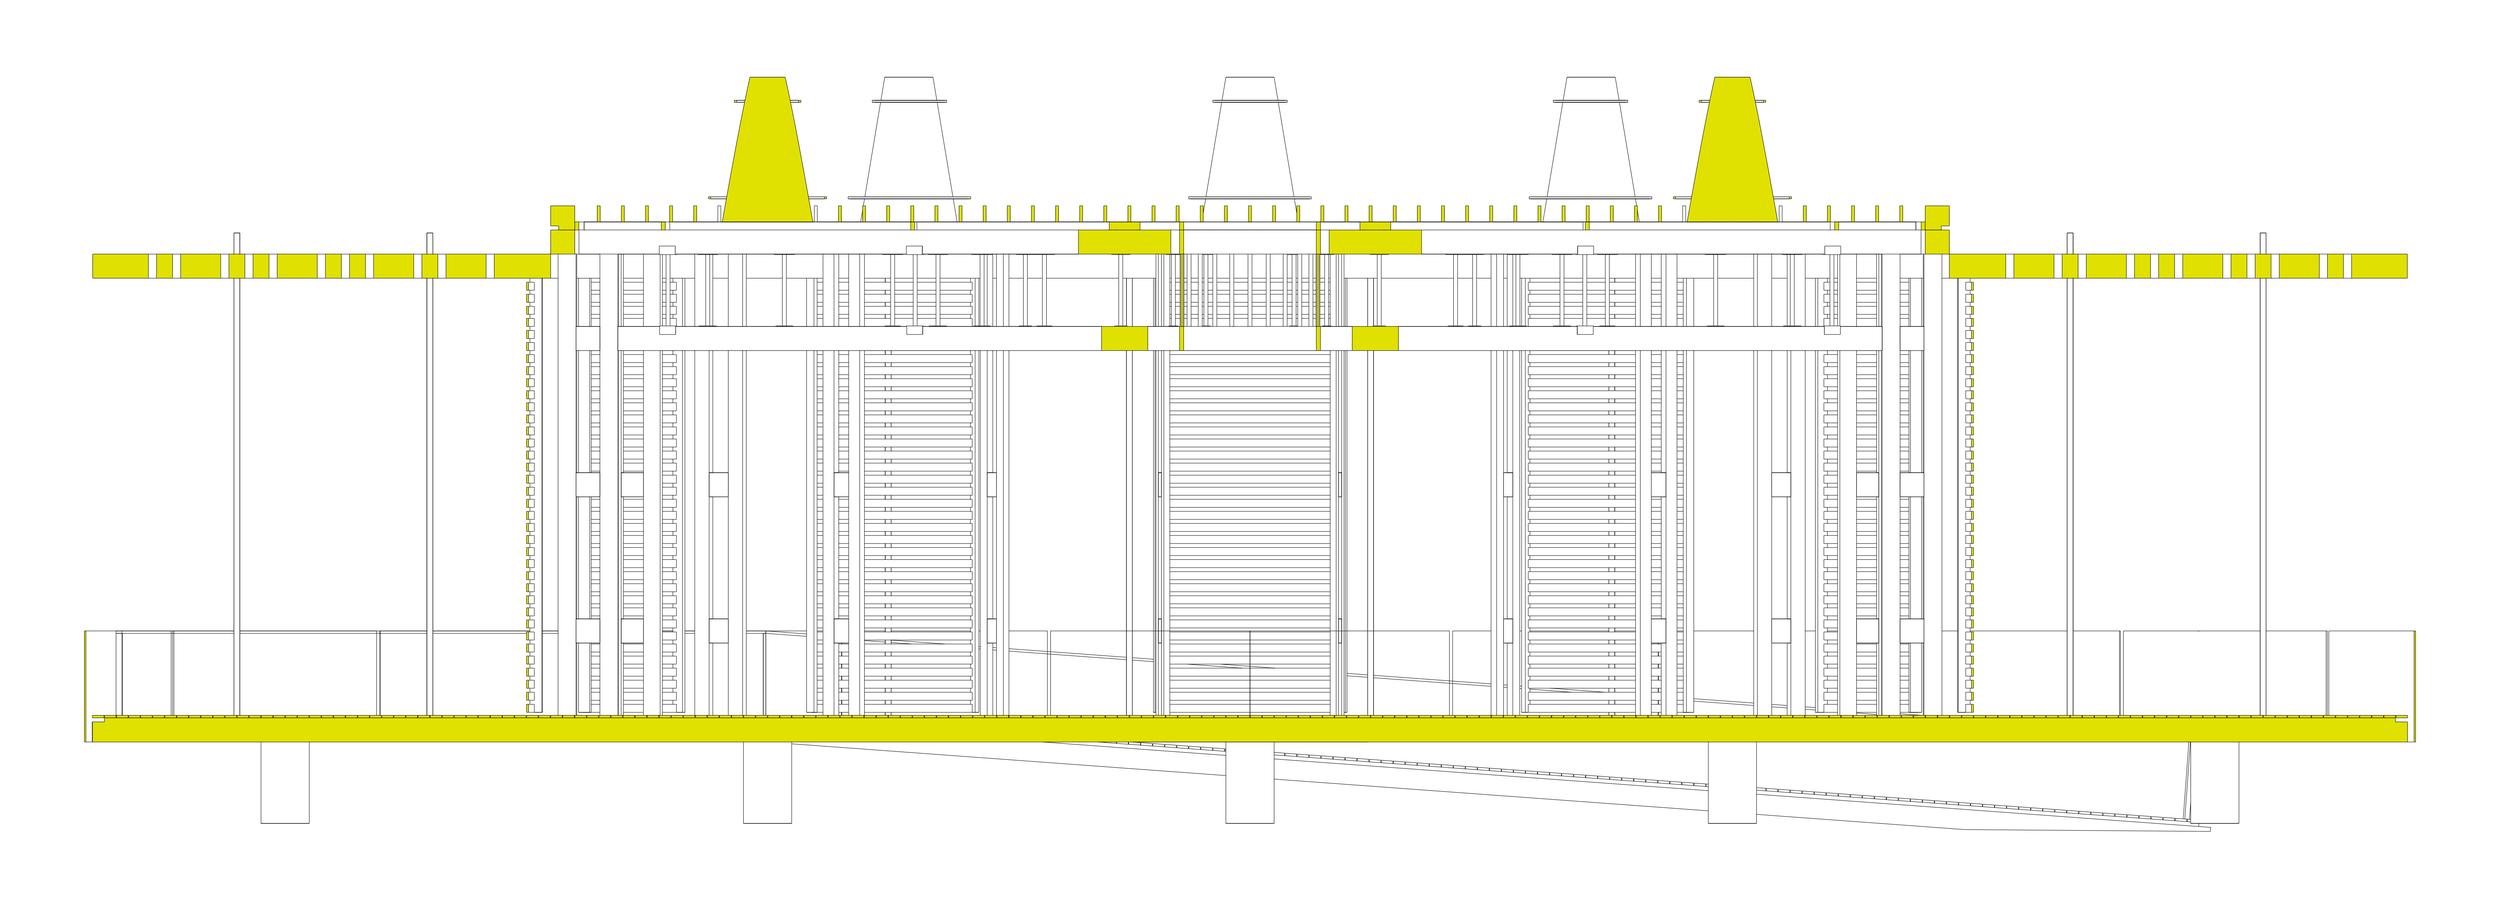 3d_carousel_01a_dynamicviewtest-Section-2 [Sheet]-003.jpg